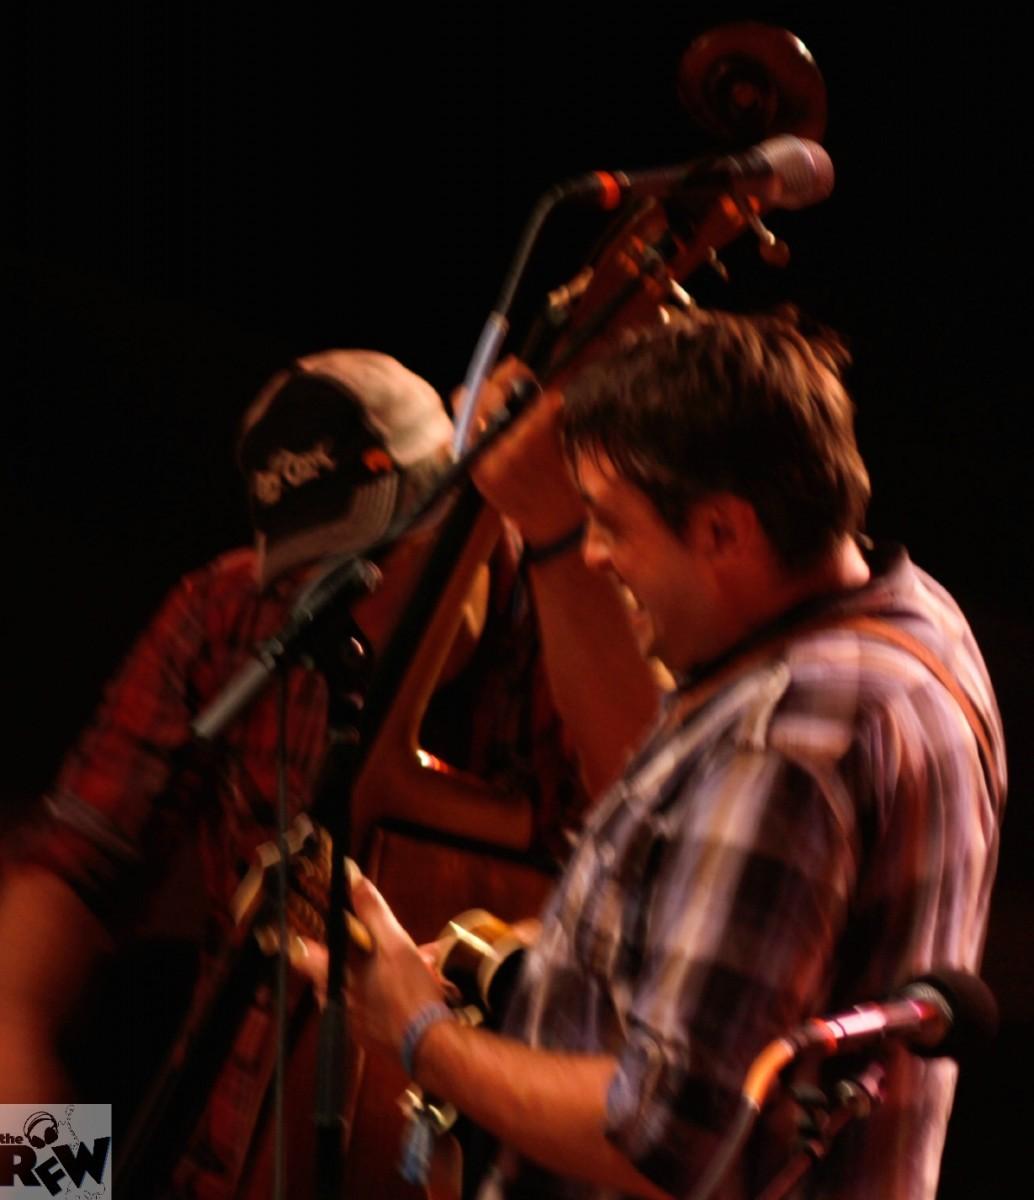 Magnolia Fest Oct 15-18, 2015 Review